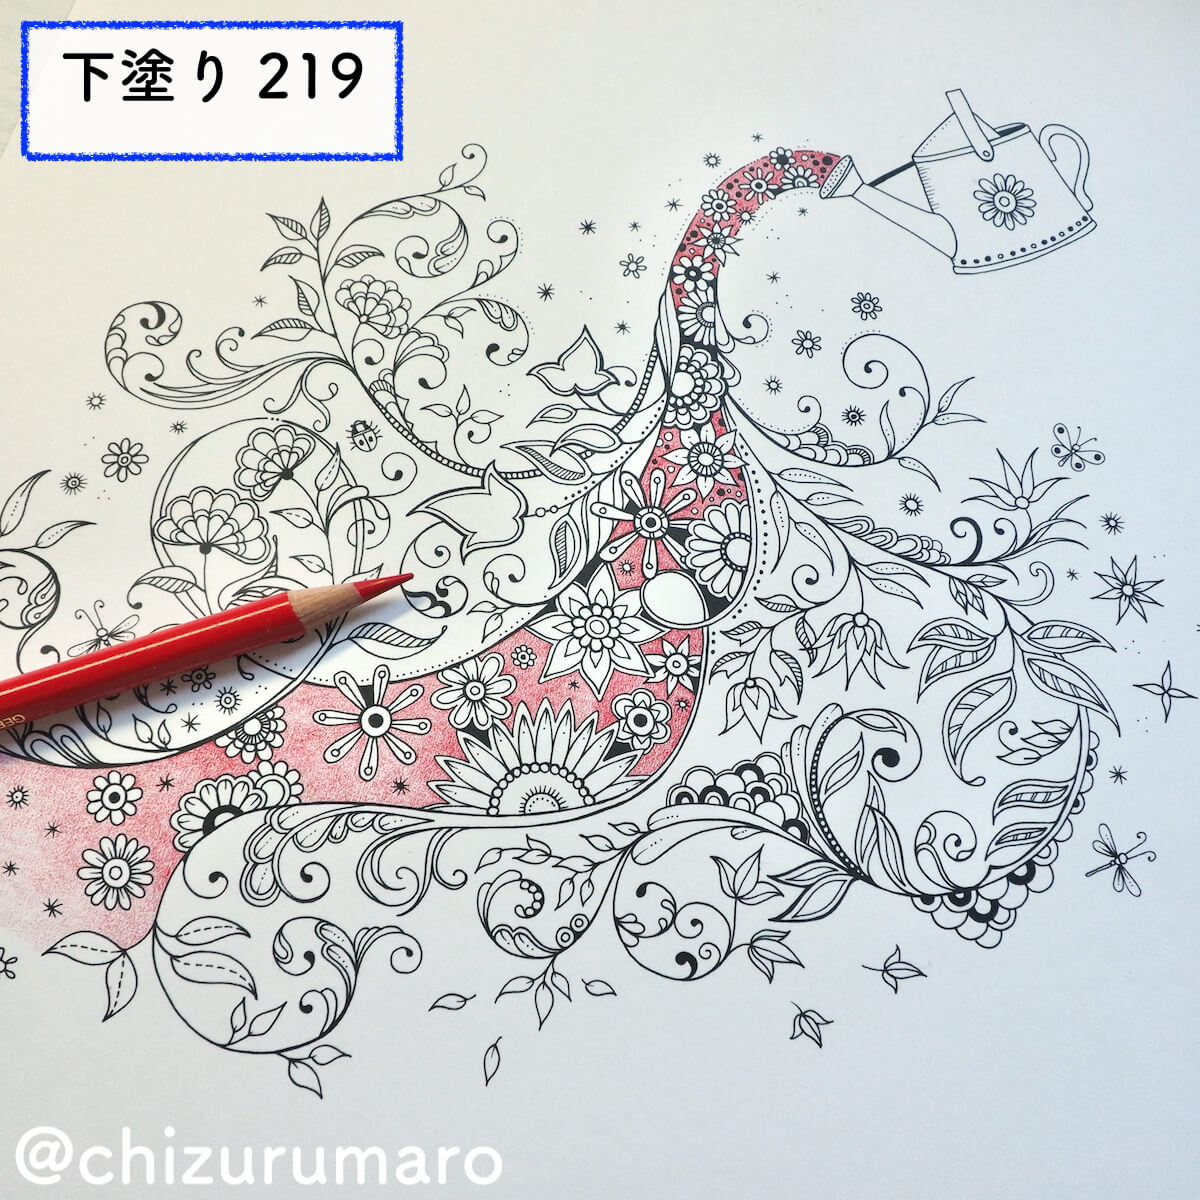 f:id:chizurumaro:20210128123002j:plain